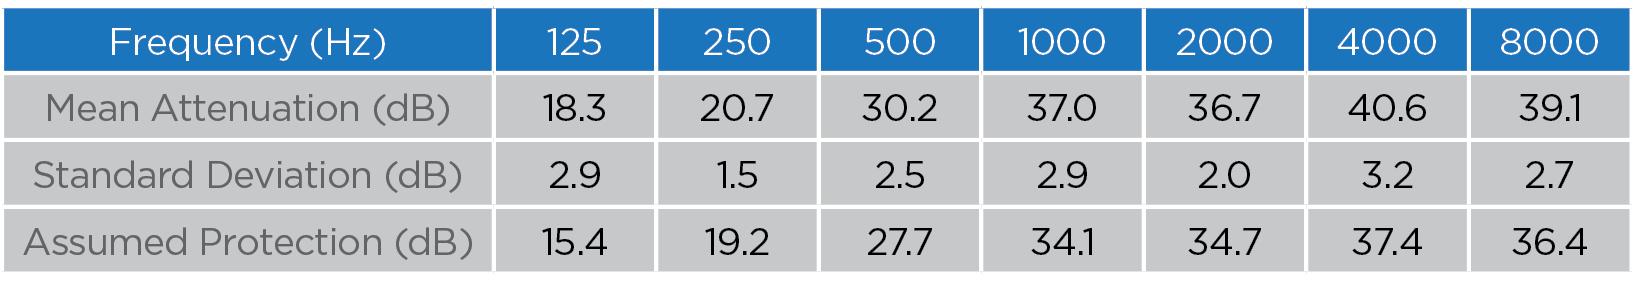 F3 attentuation data